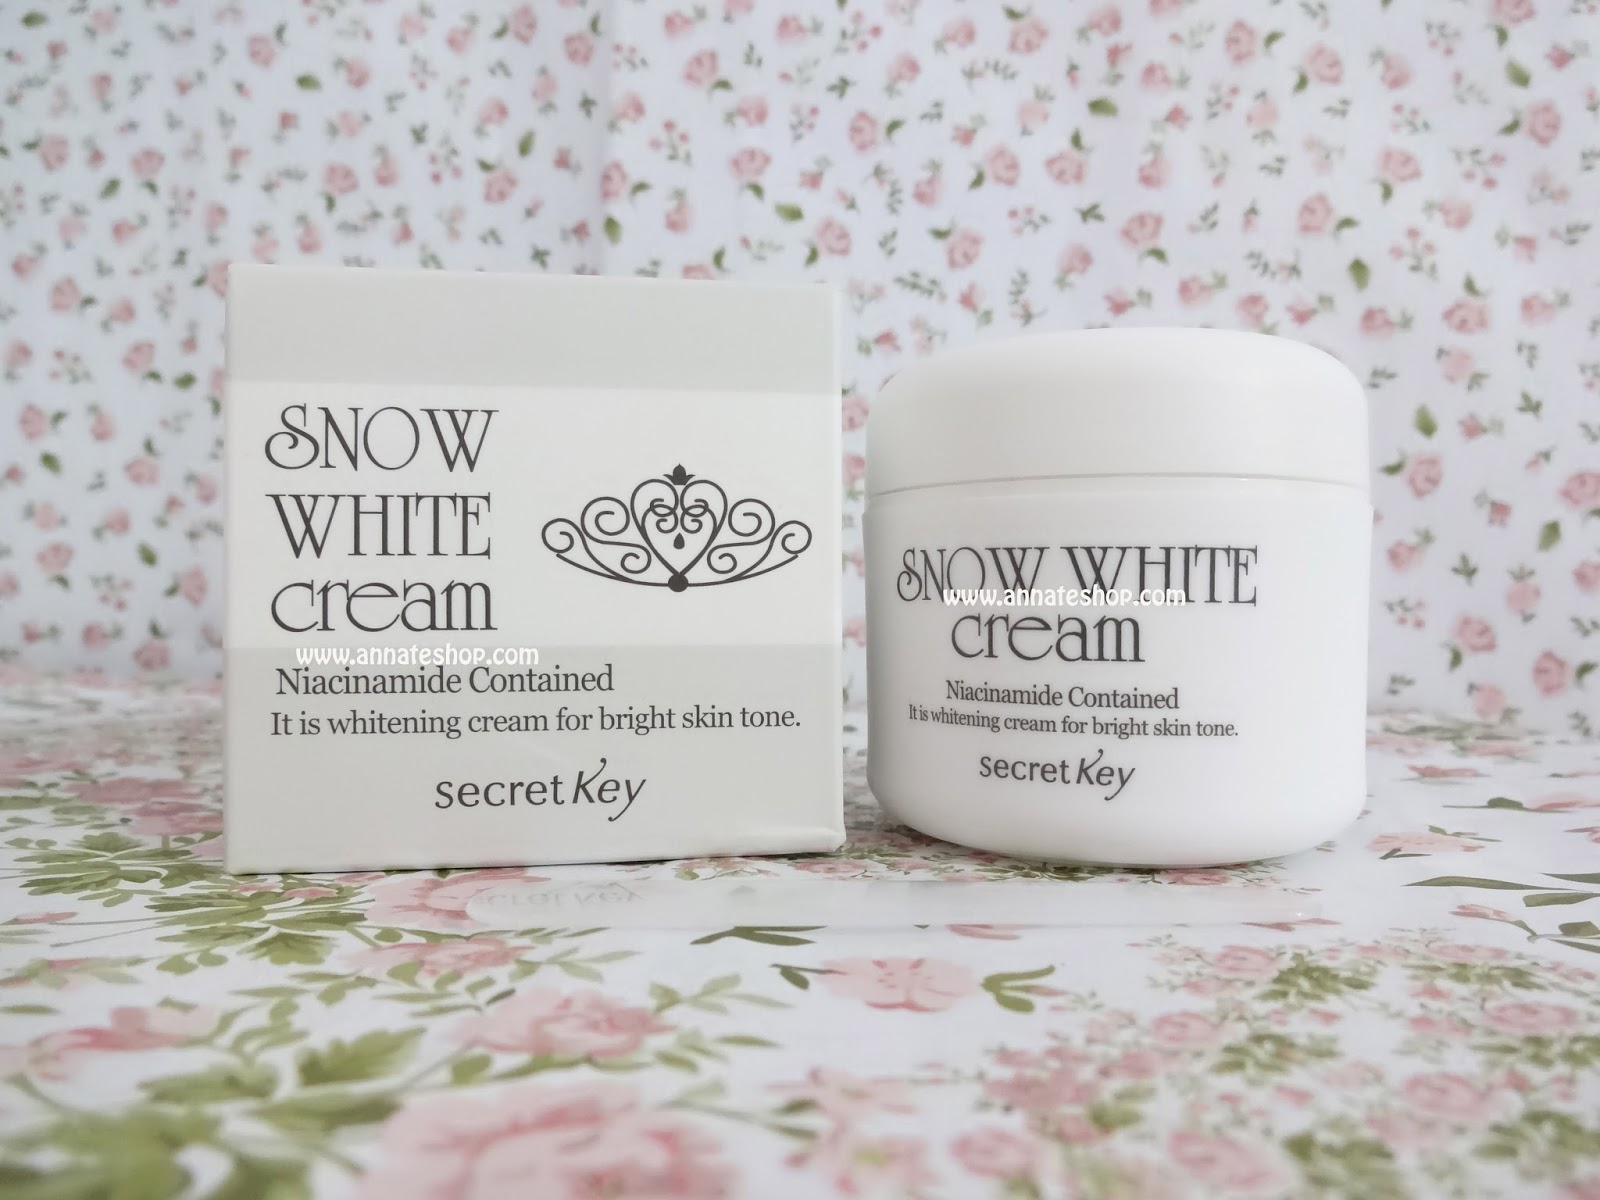 Secret Key Snow White Cream Review Whit